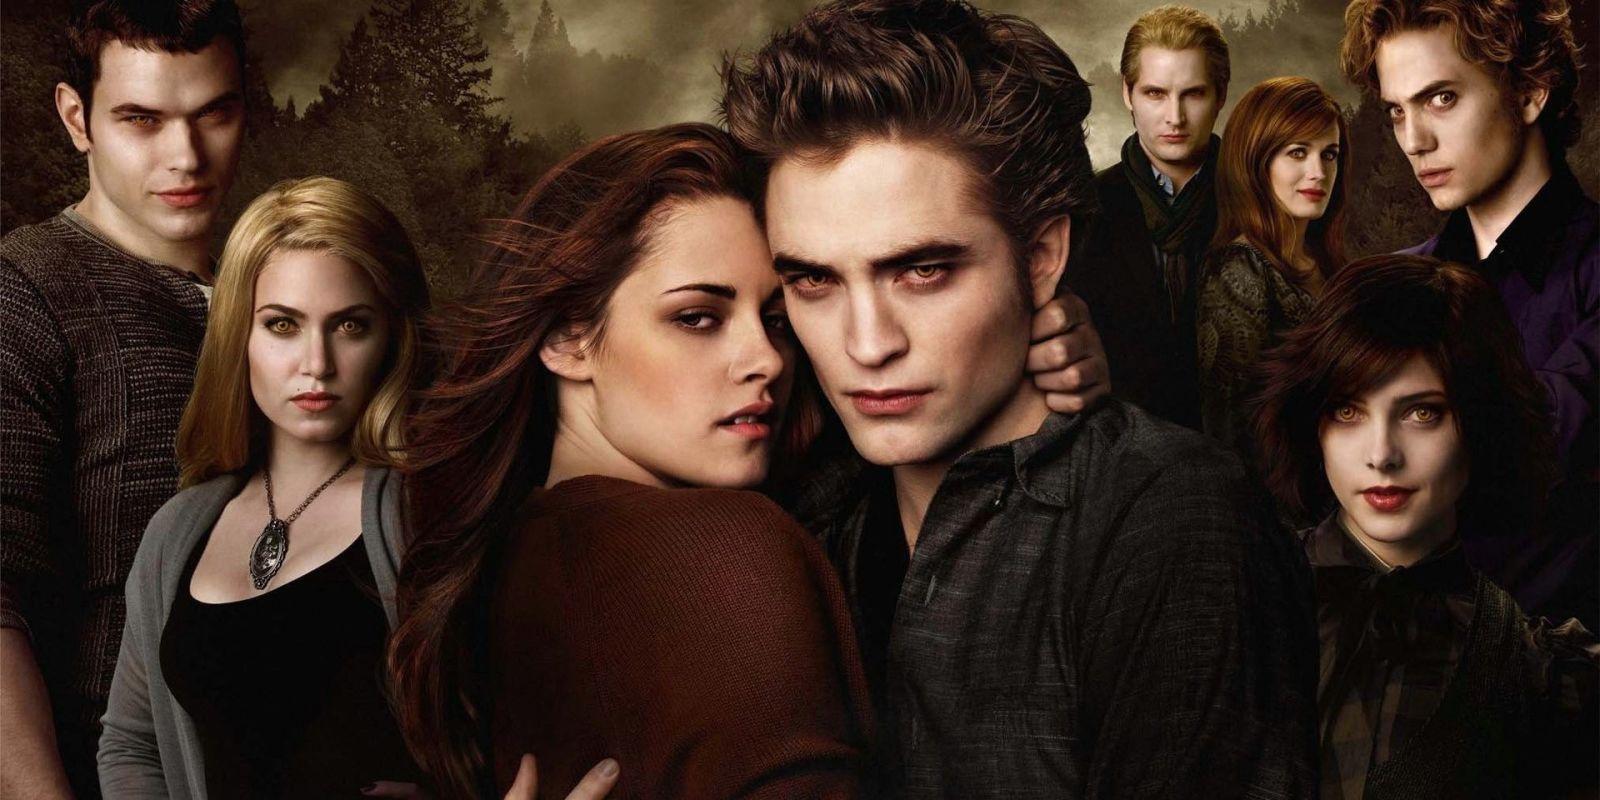 Diretora comenta sobre novo Crepúsculo com Robert Pattinson e Kristen Stewart - 1